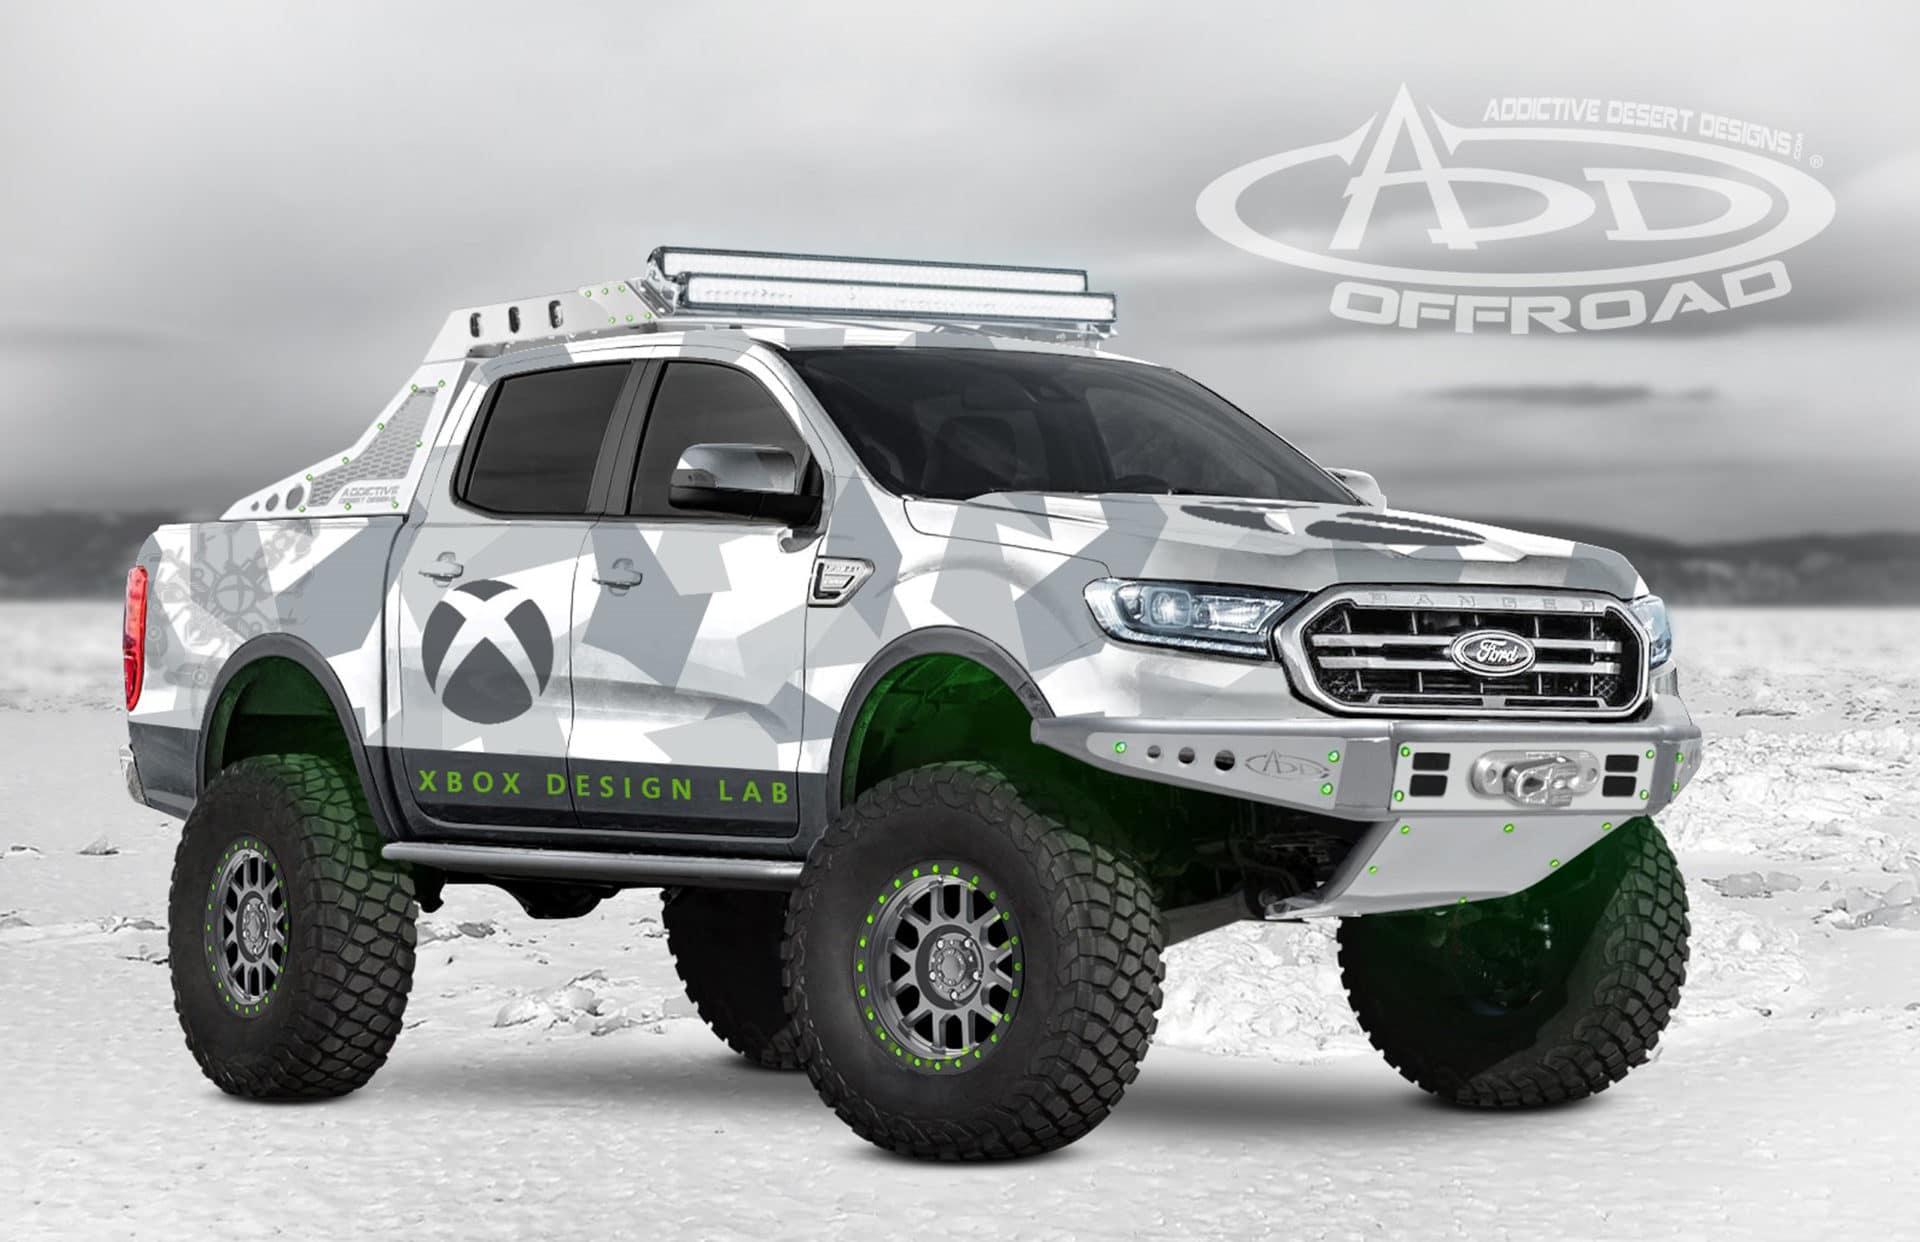 2019 Ranger XLT FX4 SuperCrew by Addictive Desert Designs